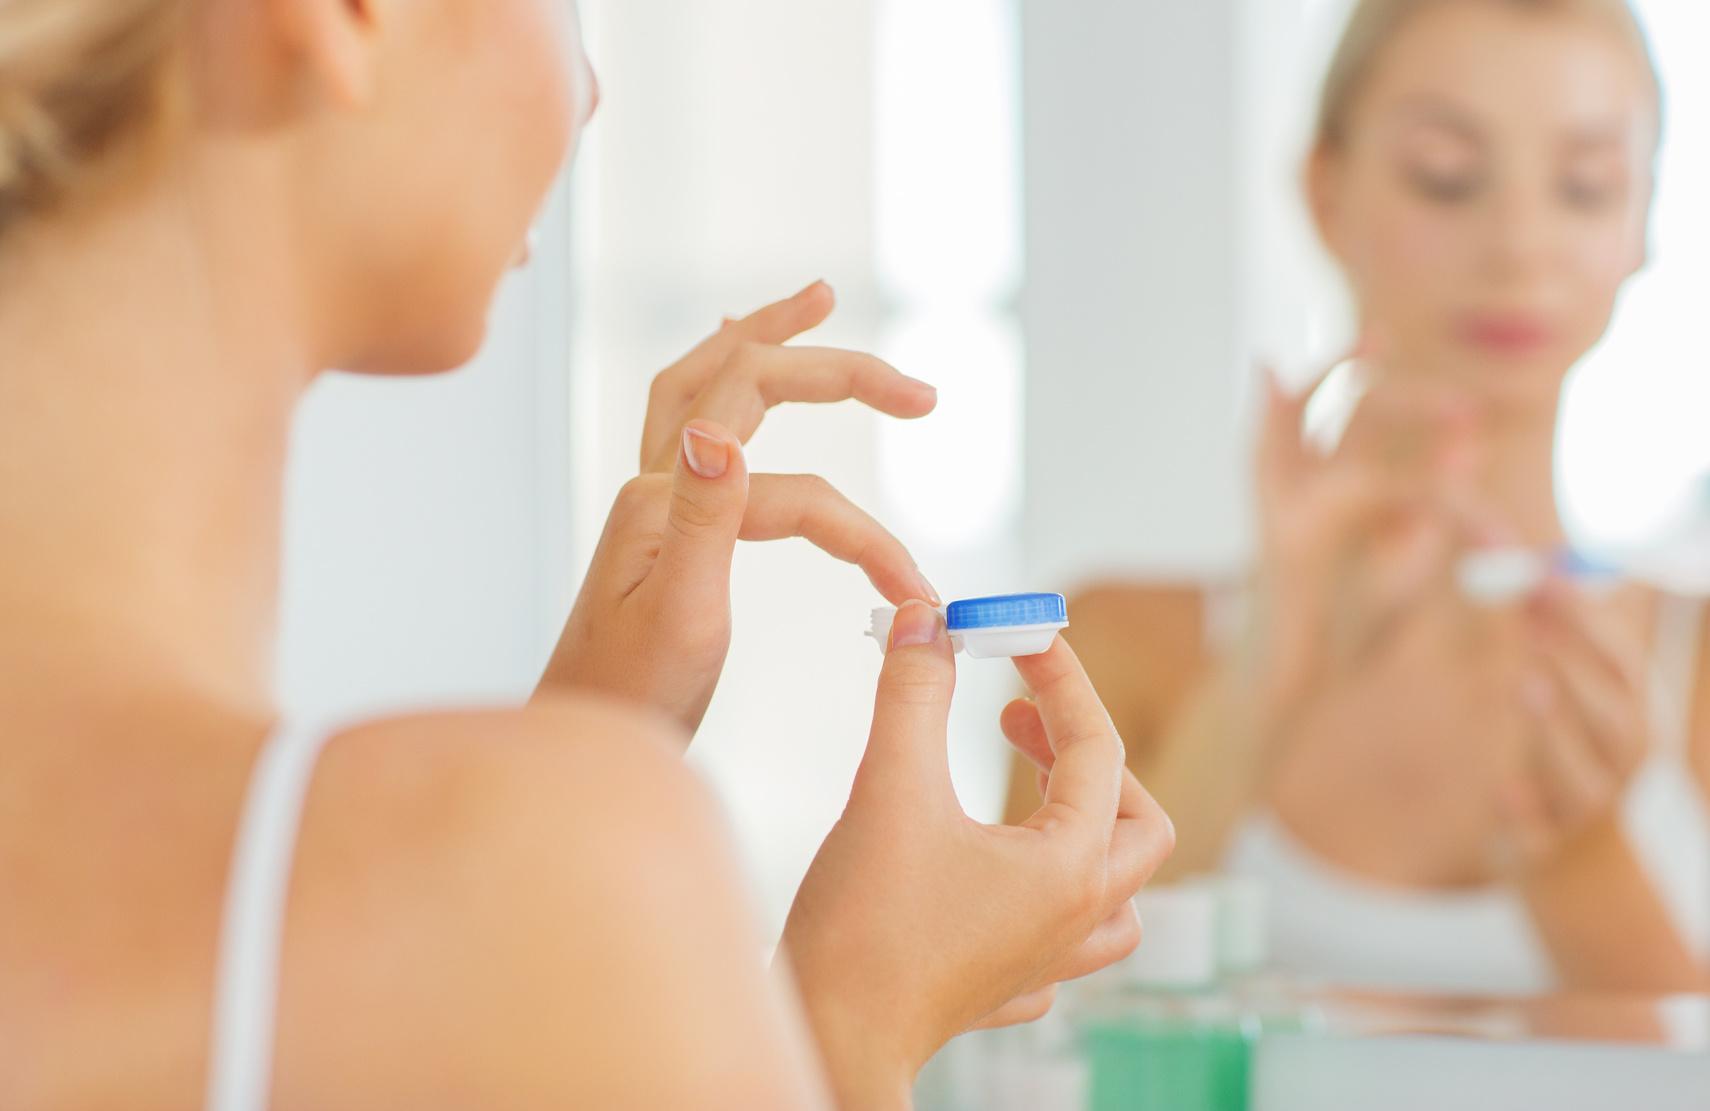 kontaktlinsenbehälter